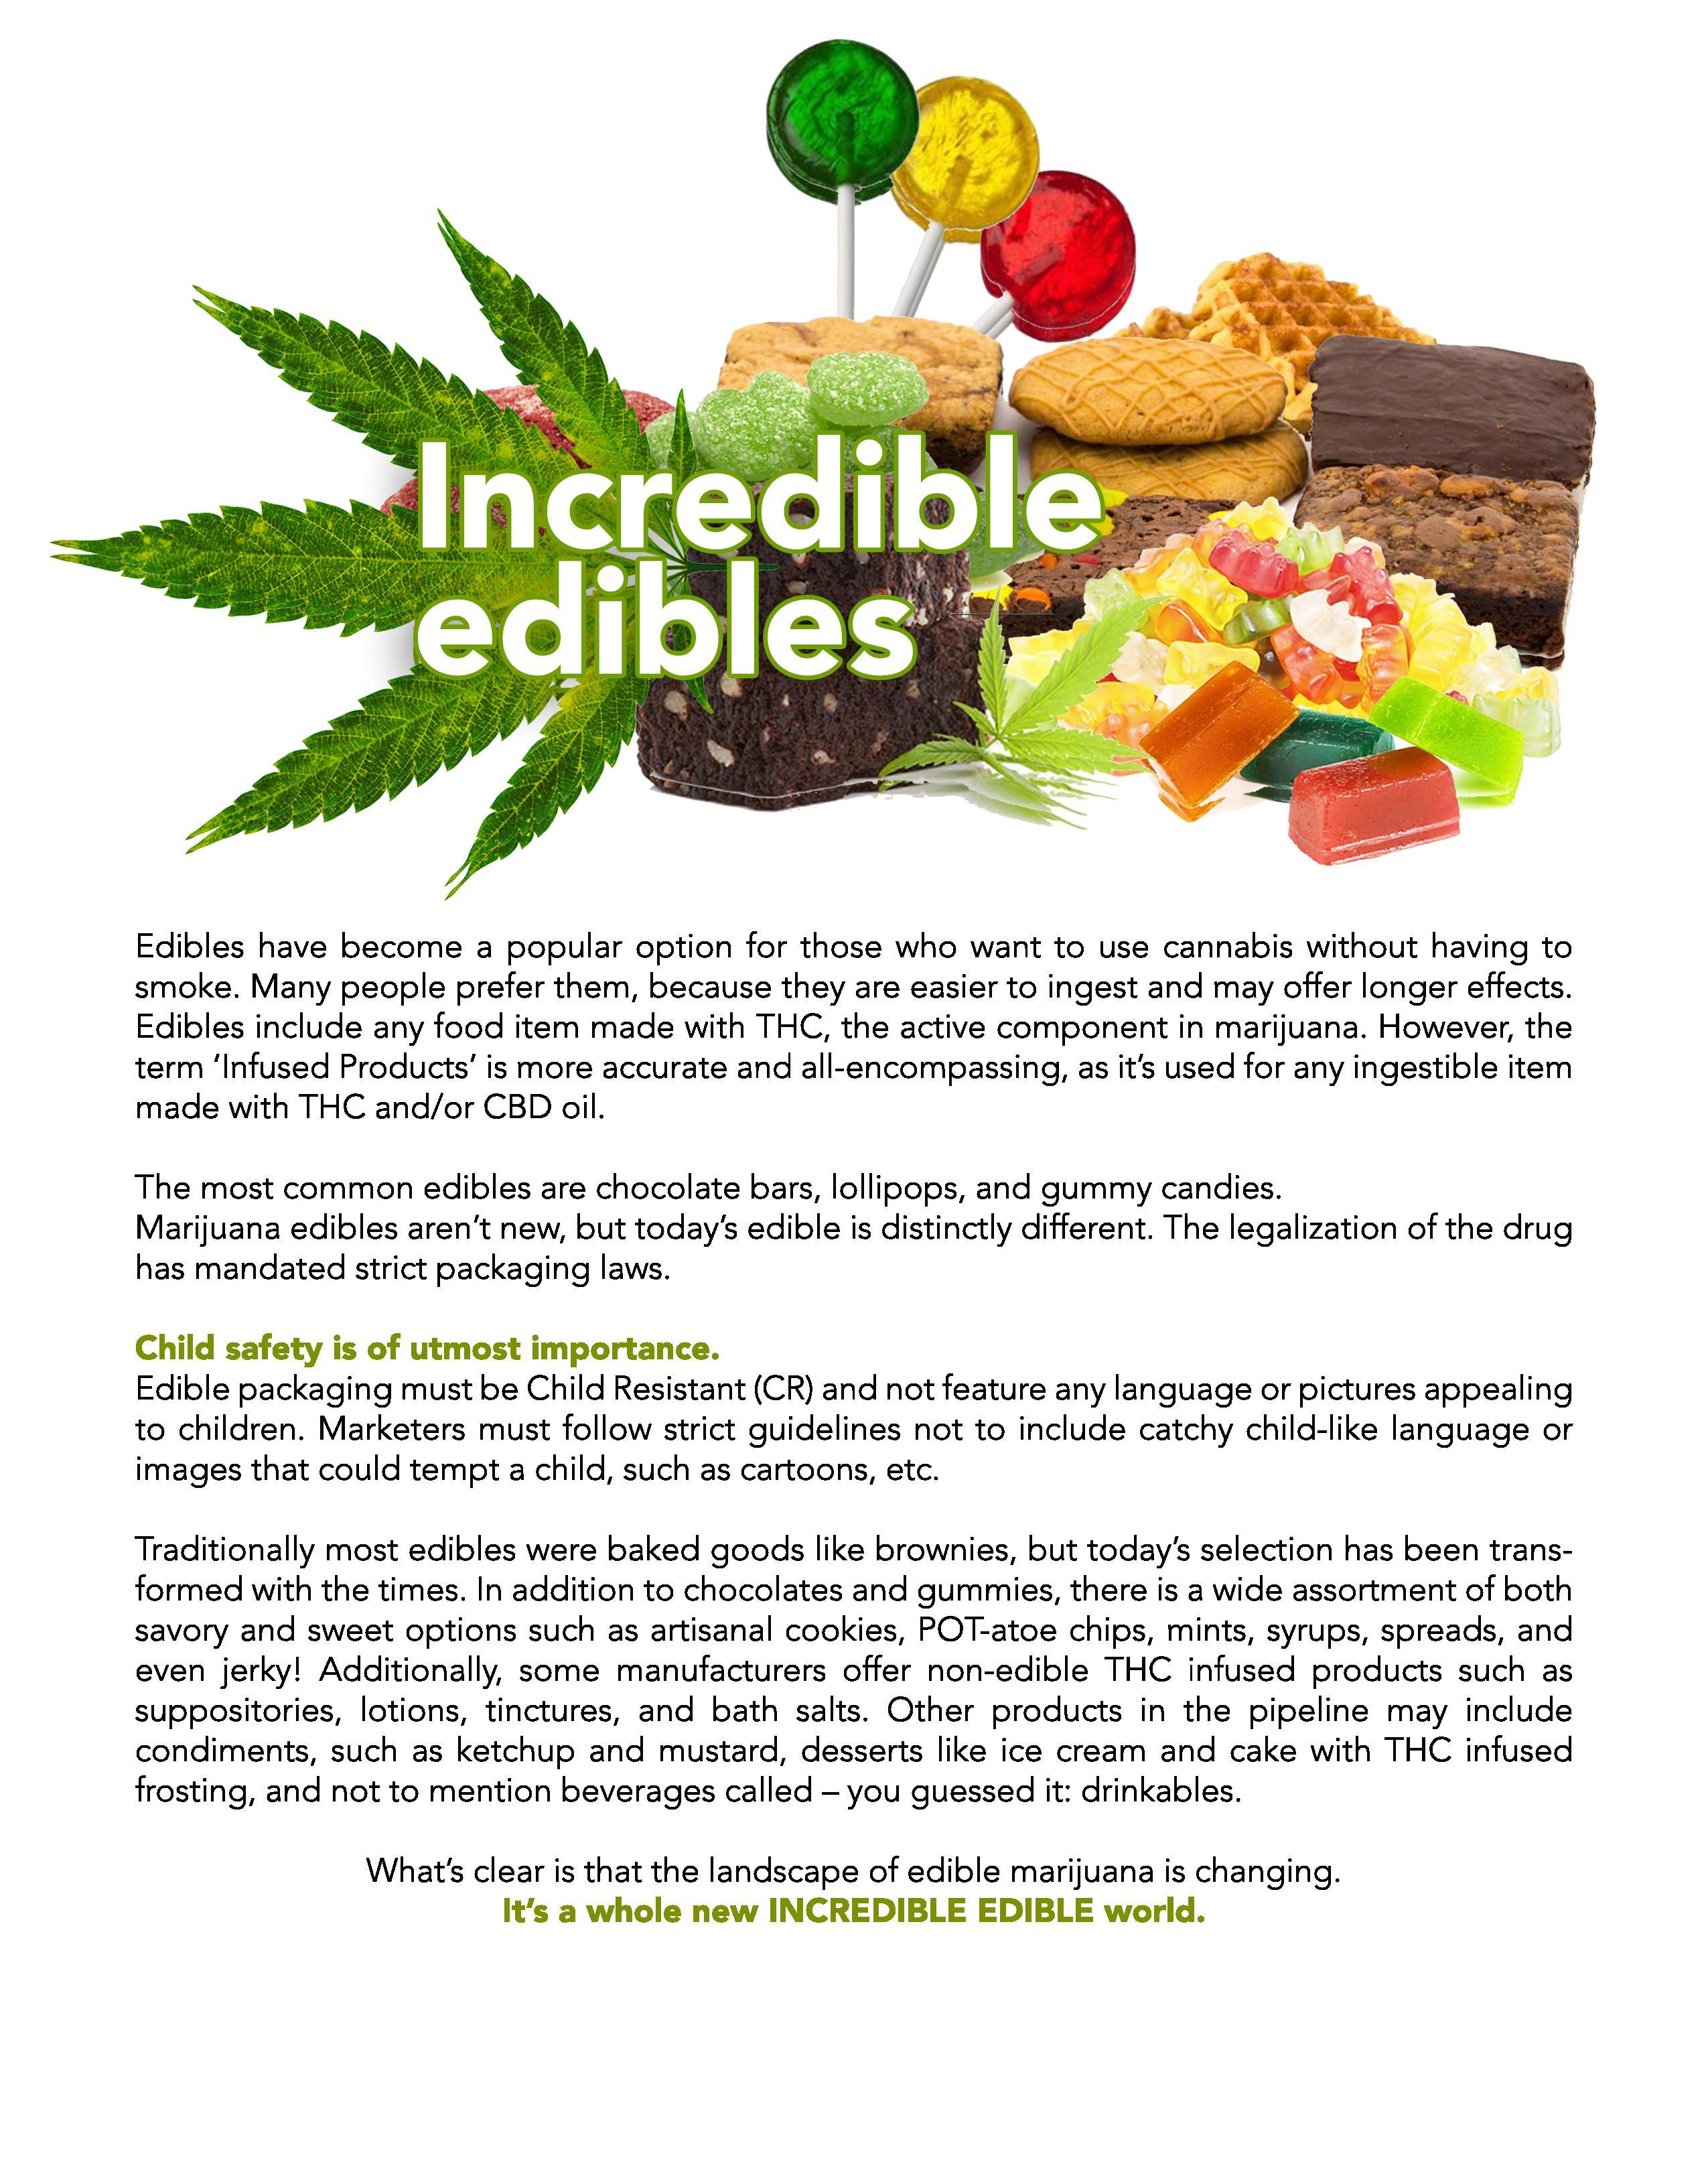 Incredible Edibles - Cannabis Edible Packaging